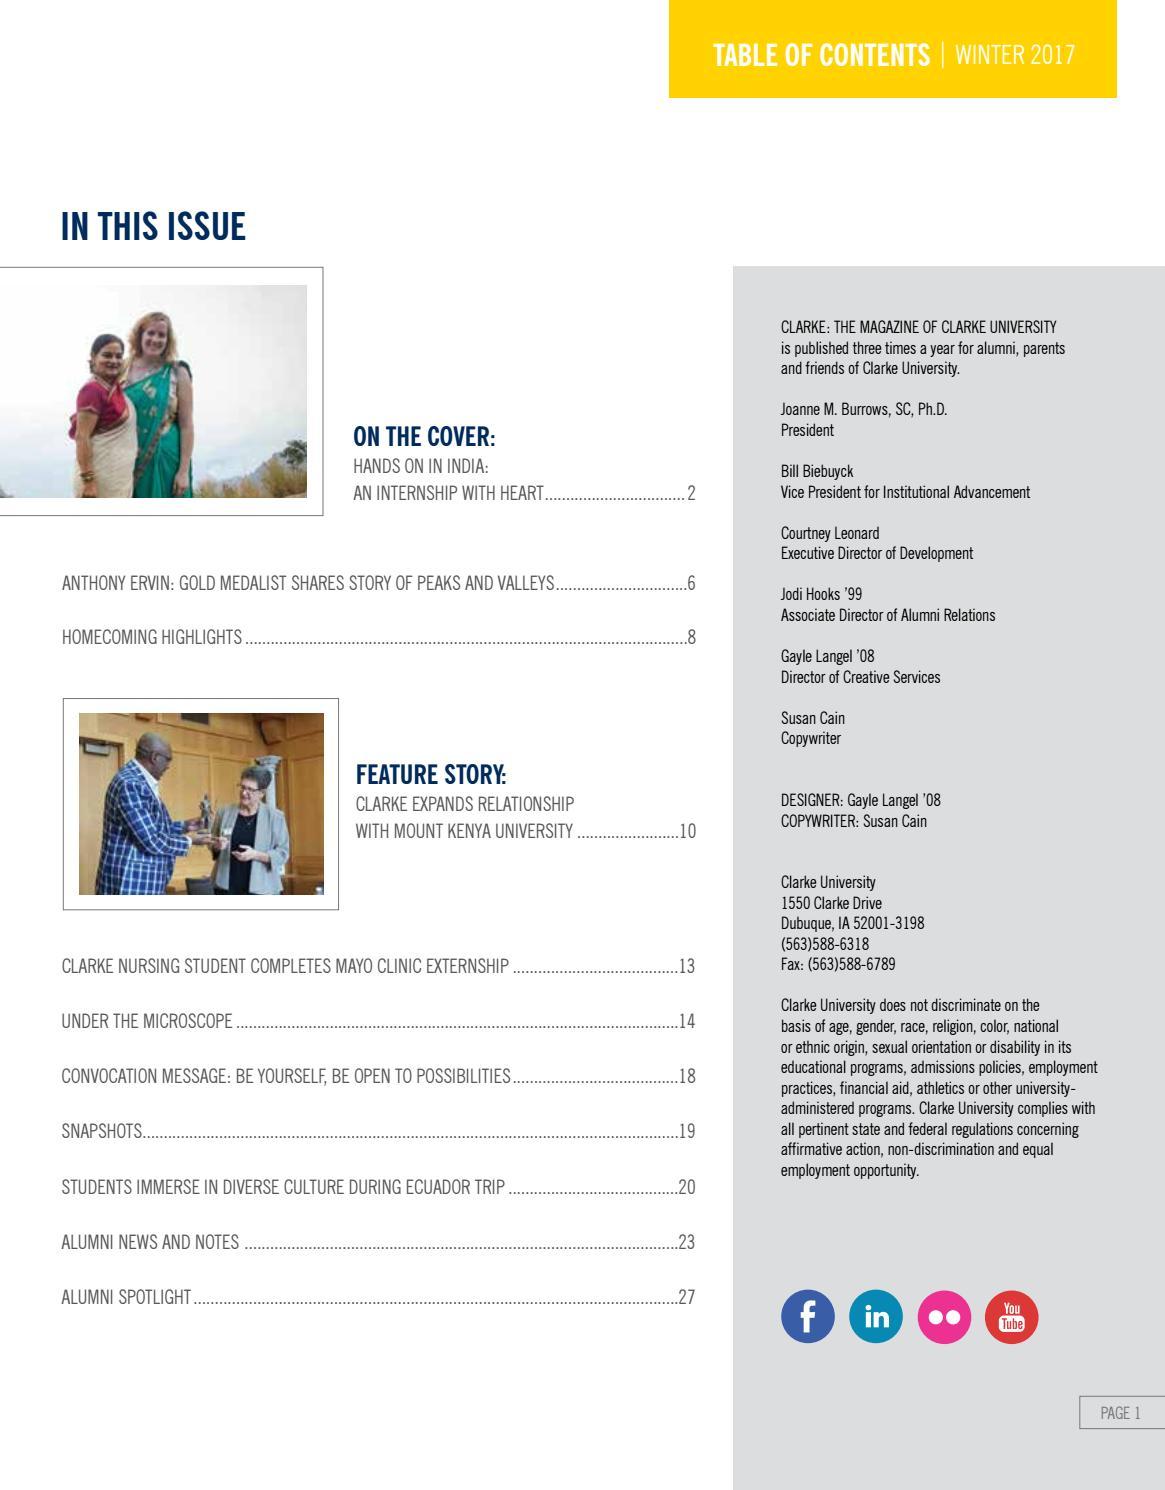 Clarke University Magazine